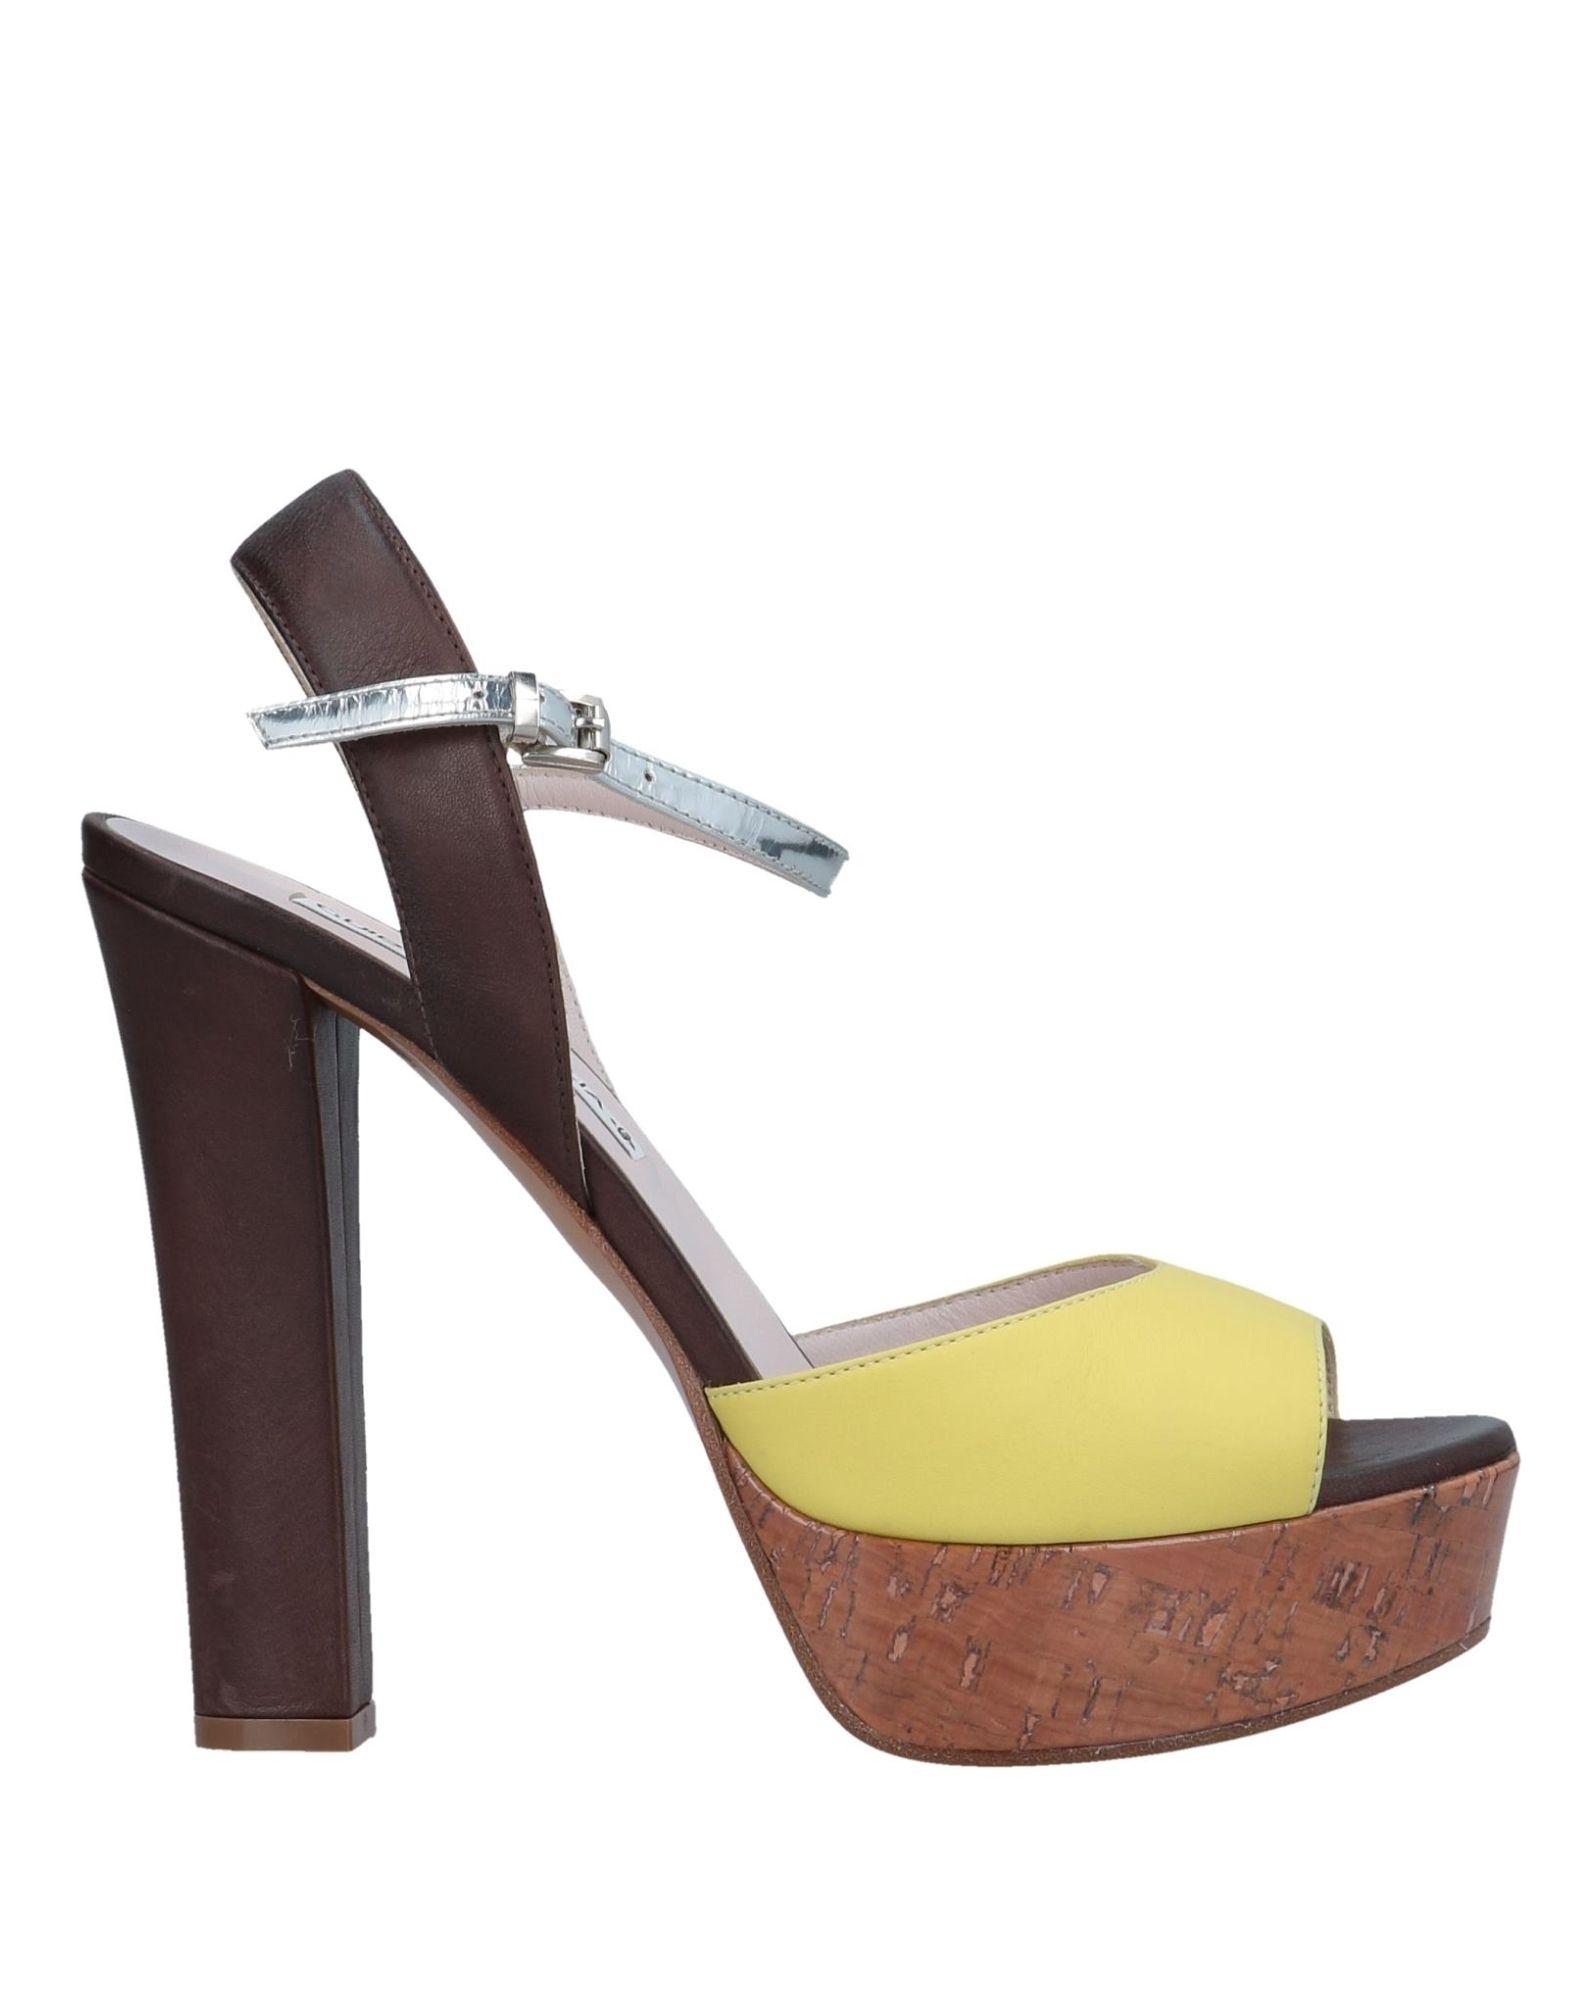 Guido Sgariglia Sgariglia Sandals - Women Guido Sgariglia Sgariglia Sandals online on  United Kingdom - 11550070PJ c01b4f